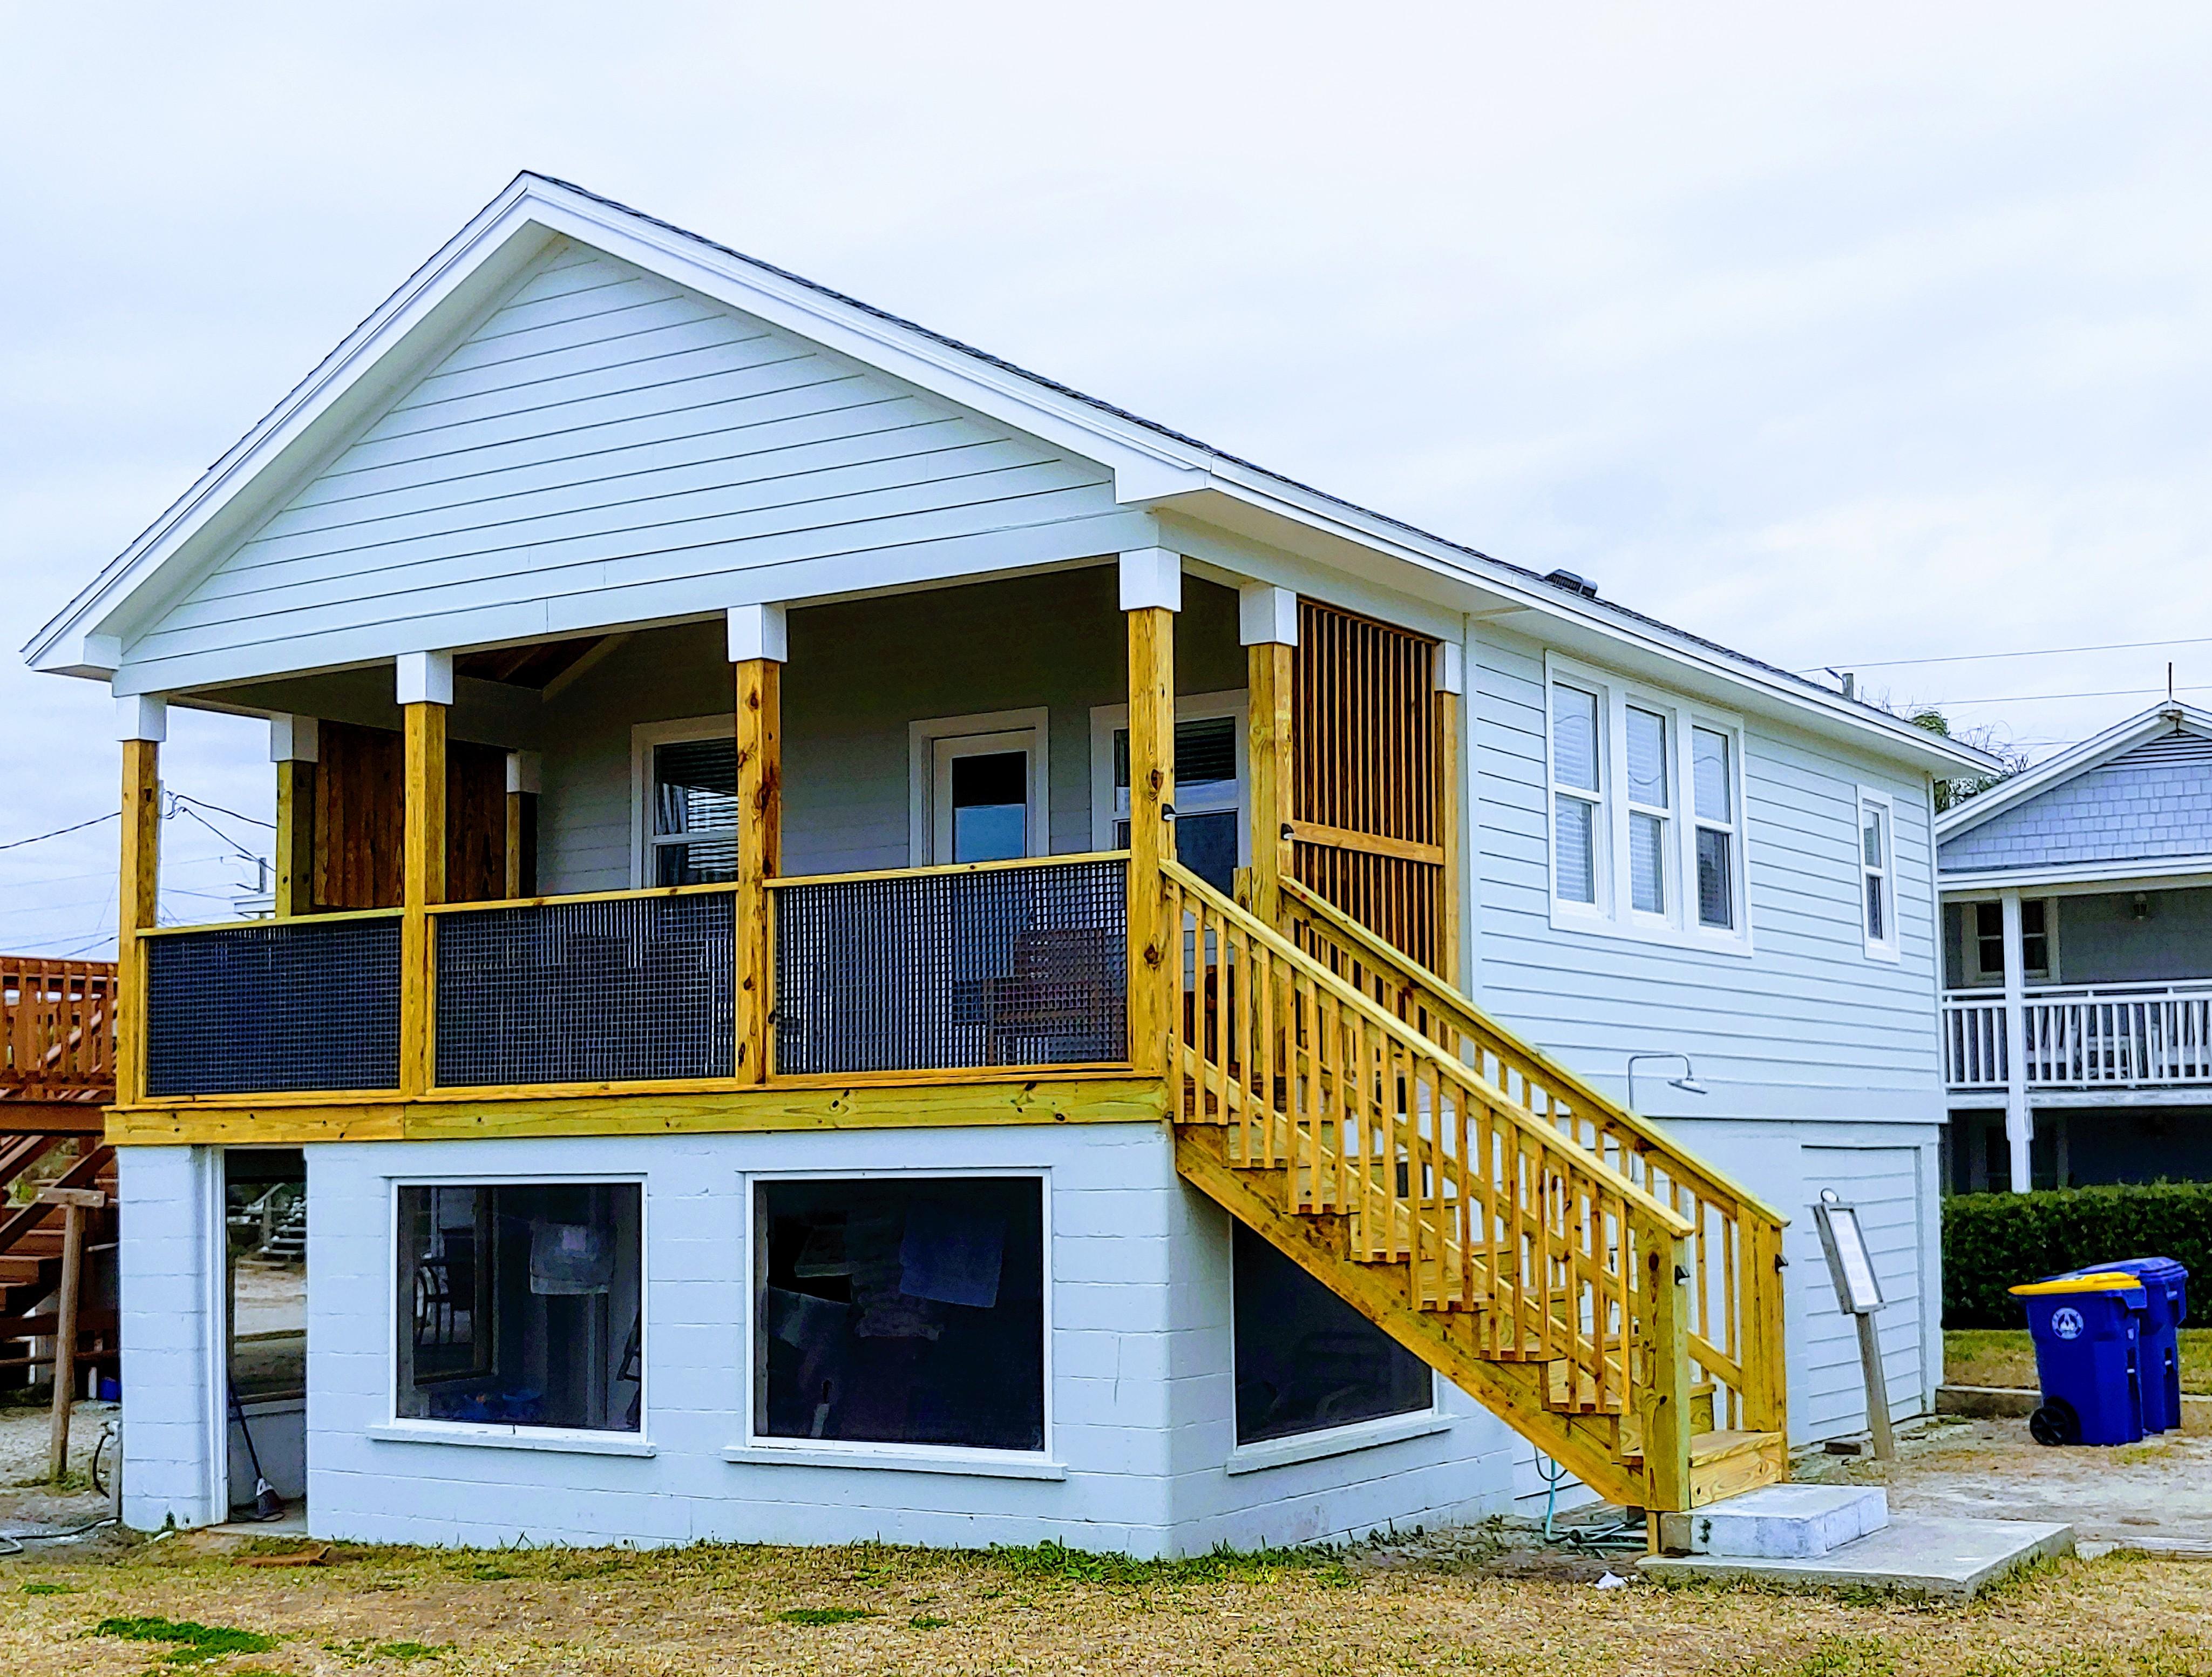 Sensational Amelia Island Beach Cottage Rustic Beach Living At Download Free Architecture Designs Embacsunscenecom